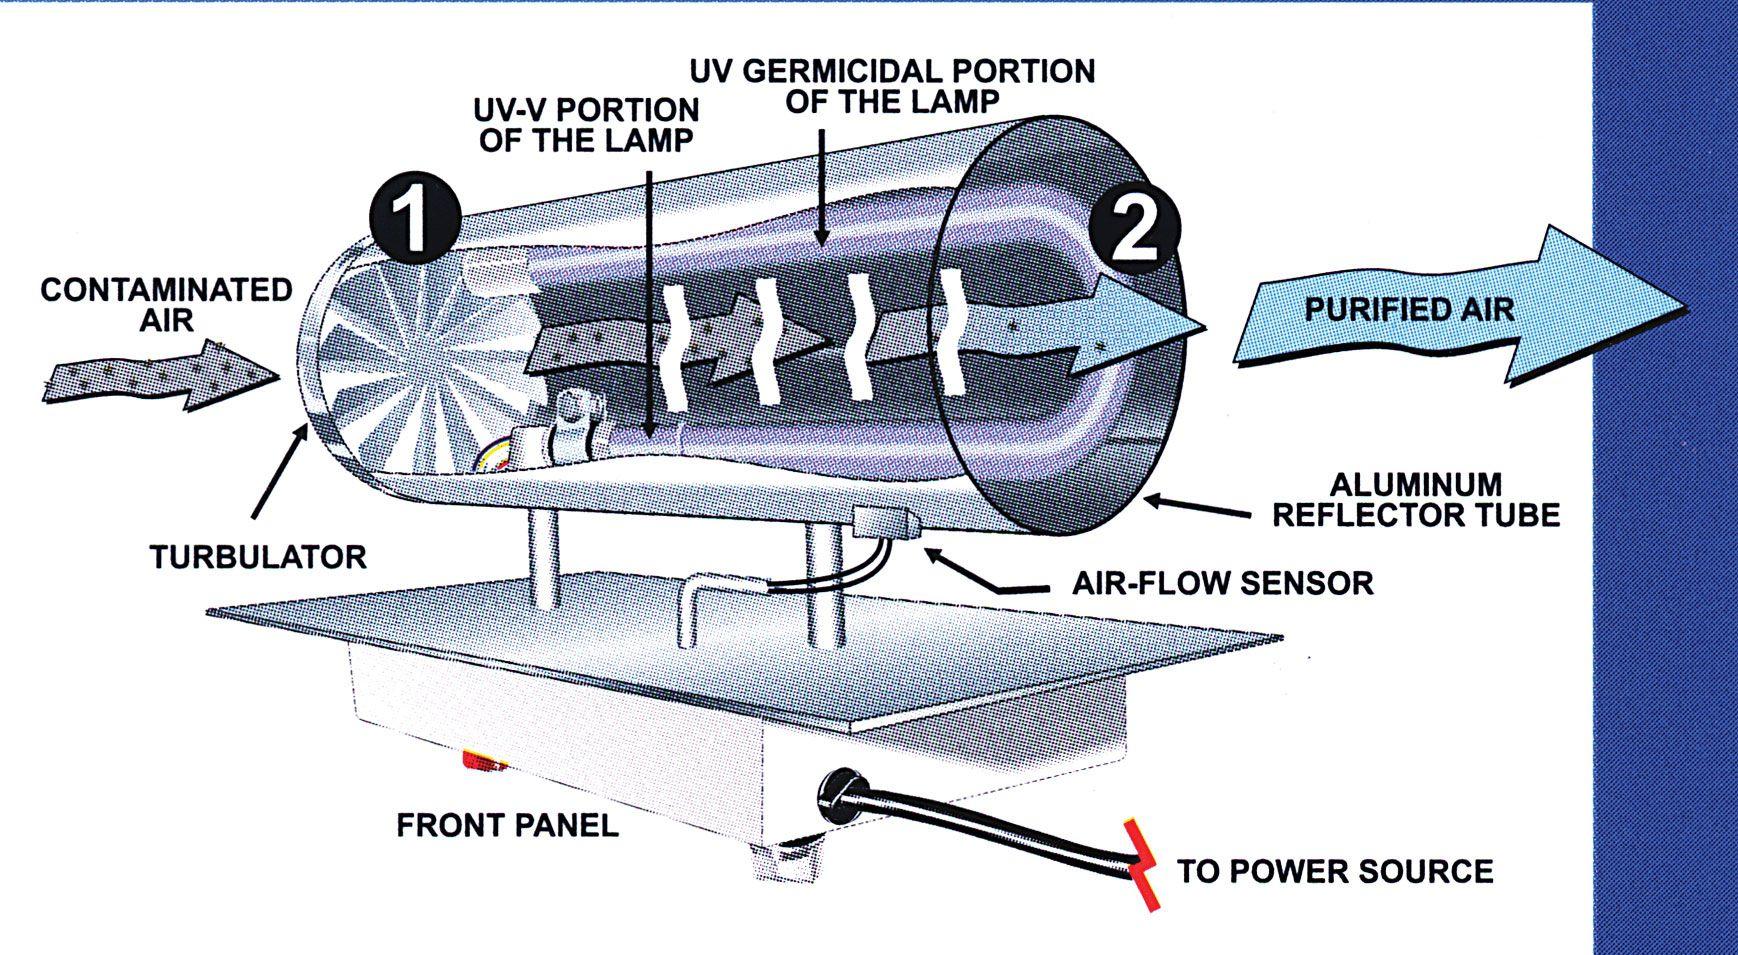 Pin by ruilin guo on uv Air purifier, Air purifier reviews